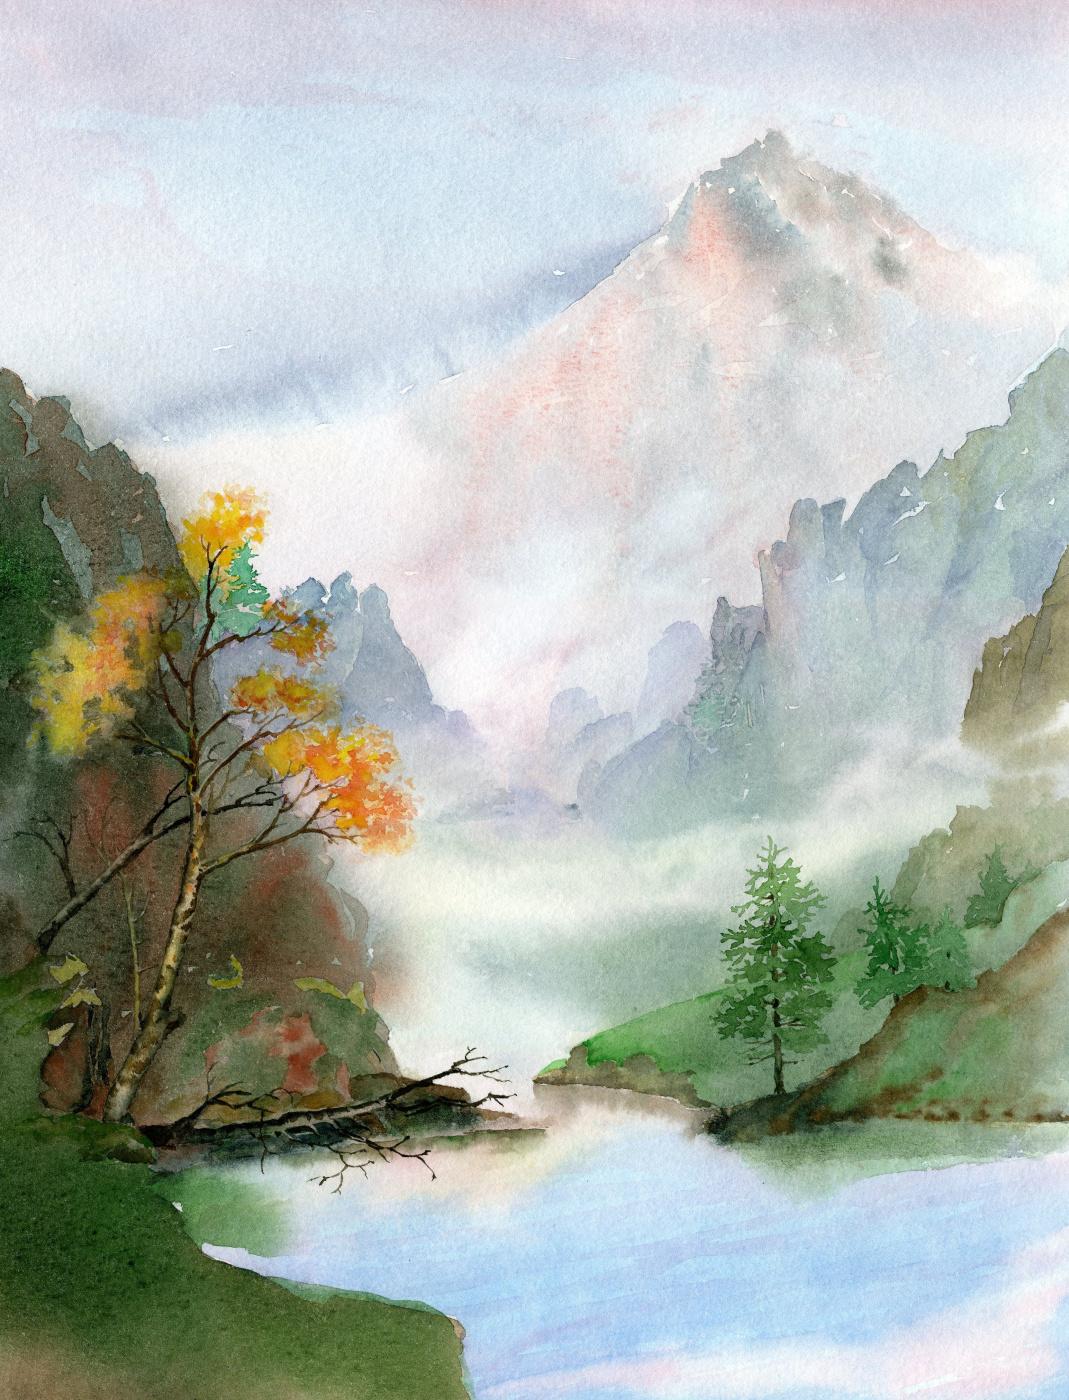 Smbat Arayevich Bagdasaryan. Ural landscape